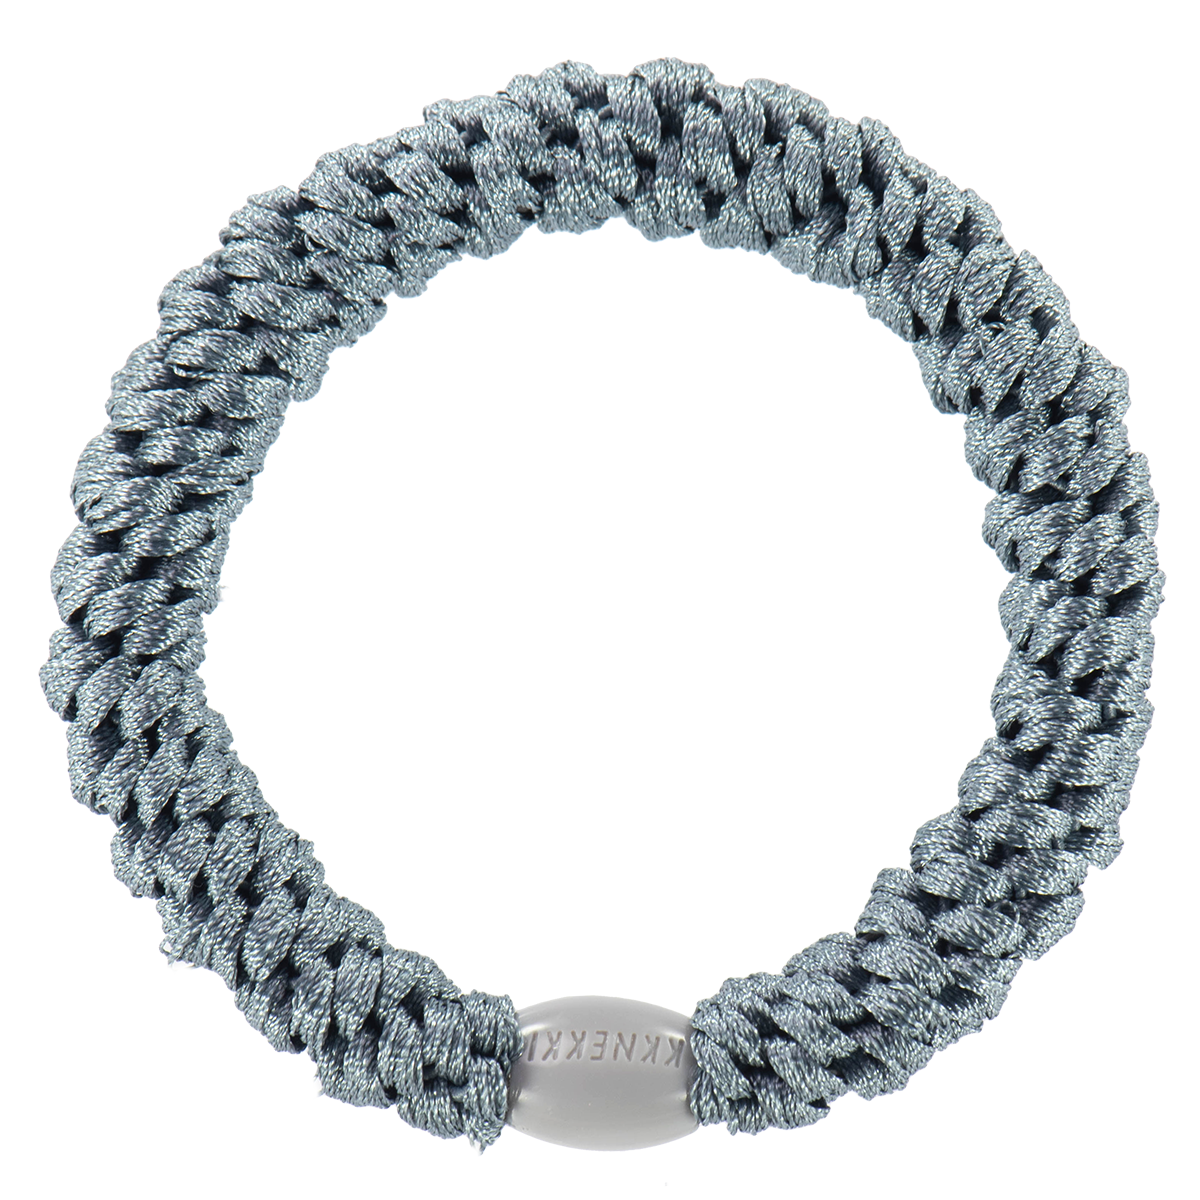 Haargummi / Armband - Dusty grey-blue 1642 - KKNEKKI